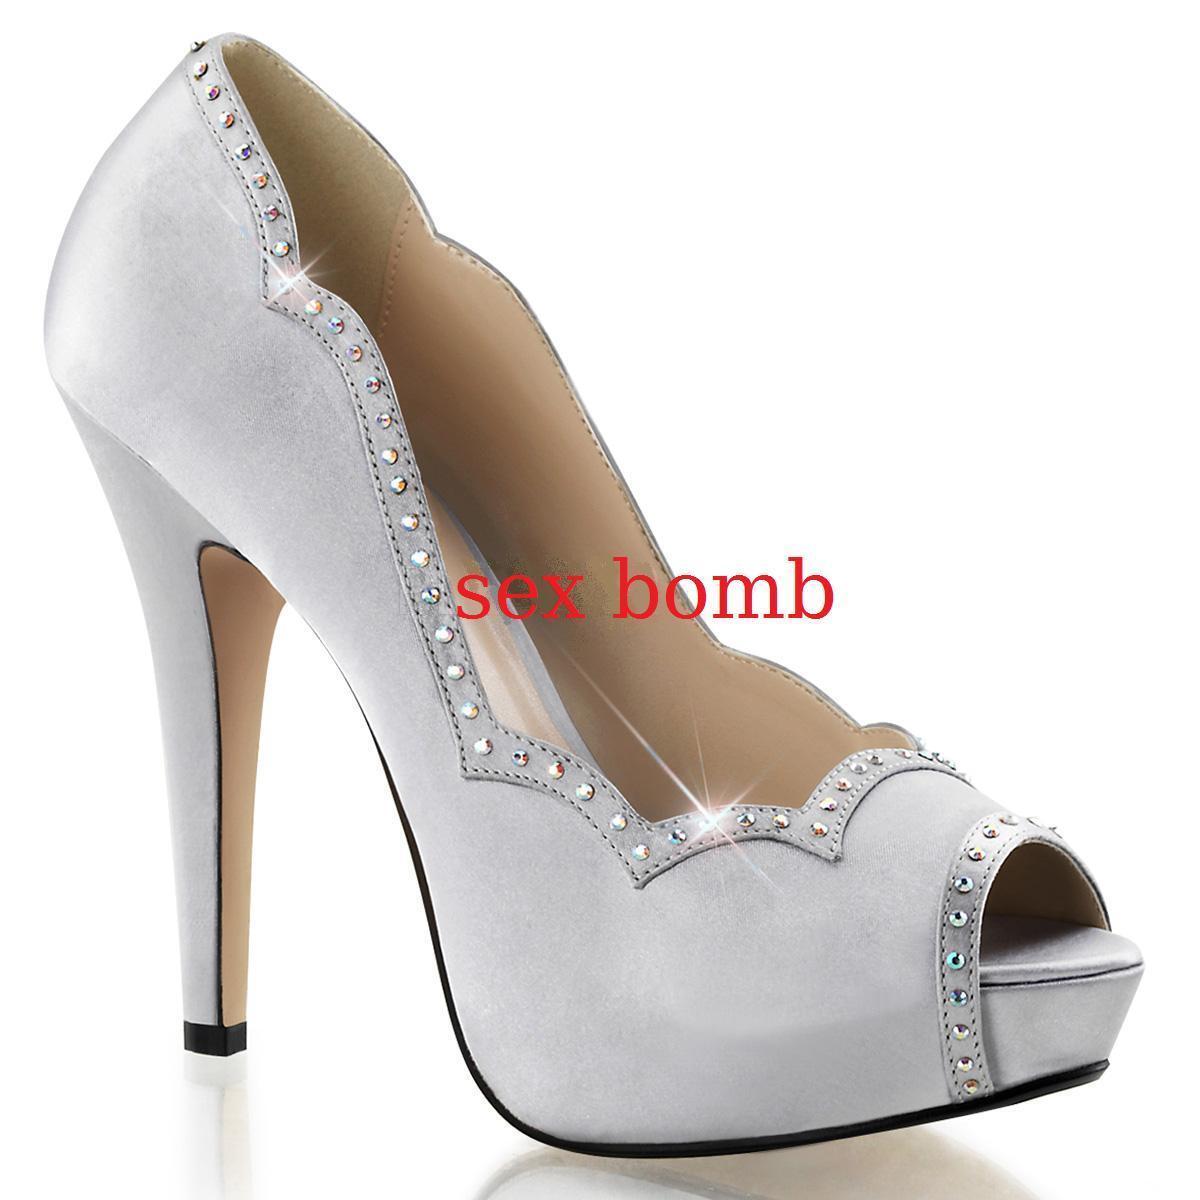 SEXY shoes DECOLTE' STRASS tacco 13 dal 35 al 41 silver satin spuntate PLATEAU